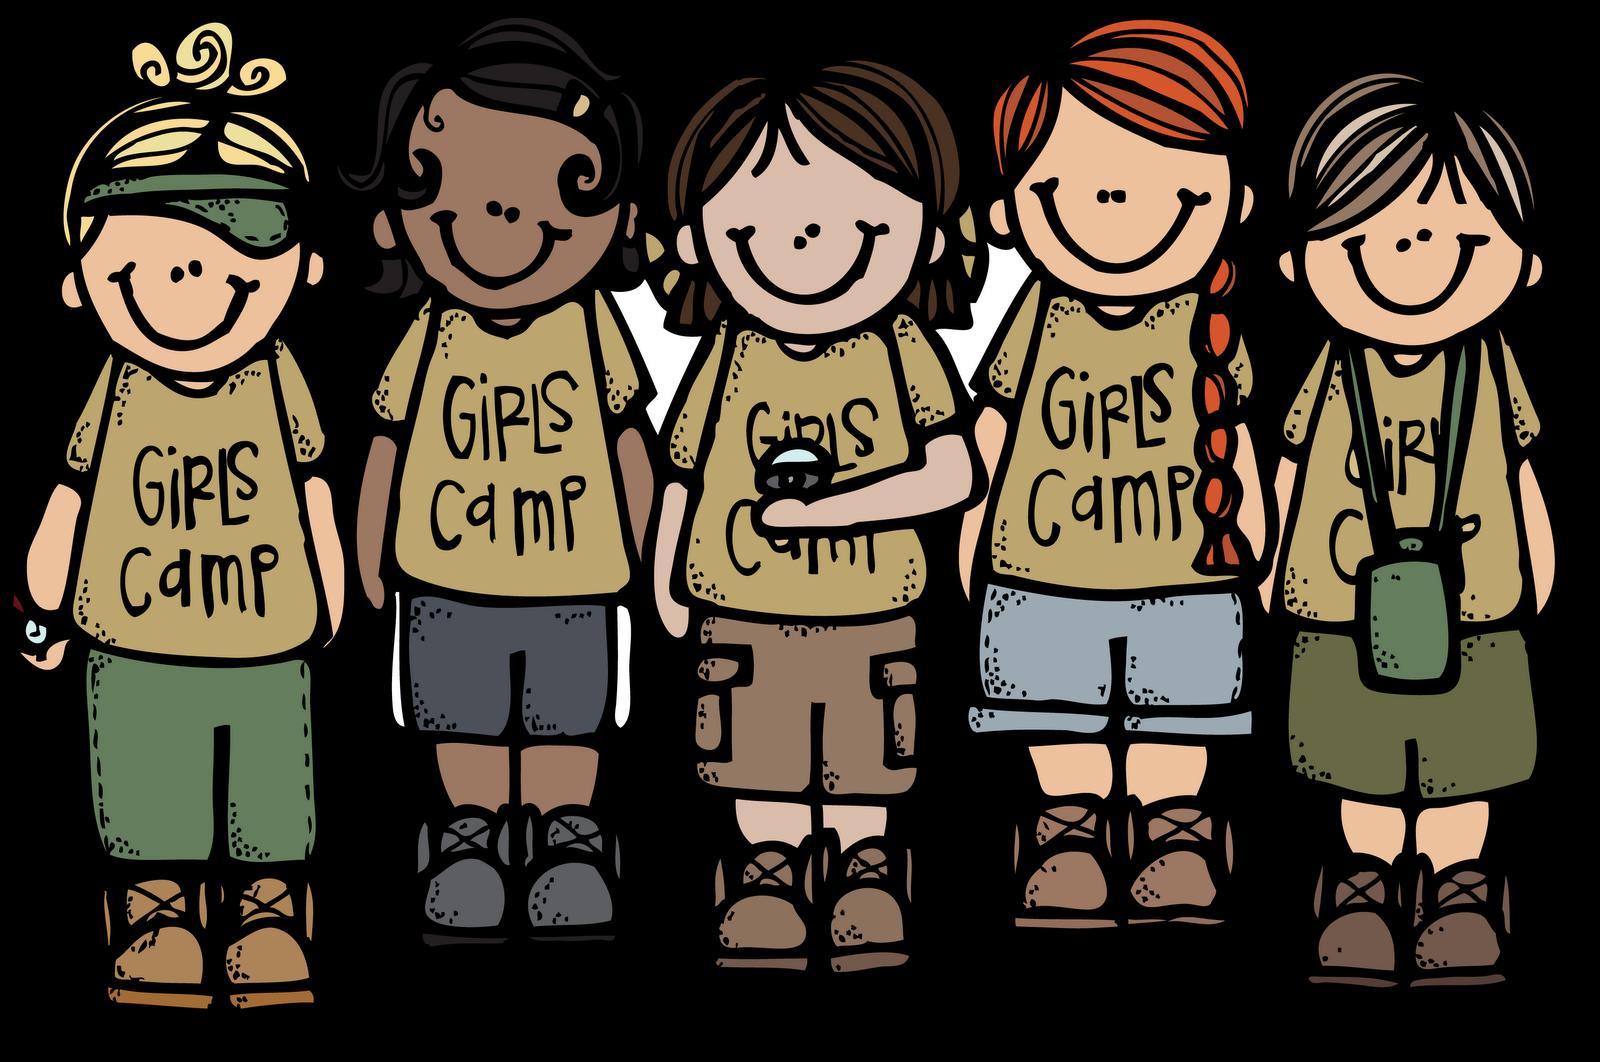 Mailbox clipart melonheadz. Lds illustrating girls camp